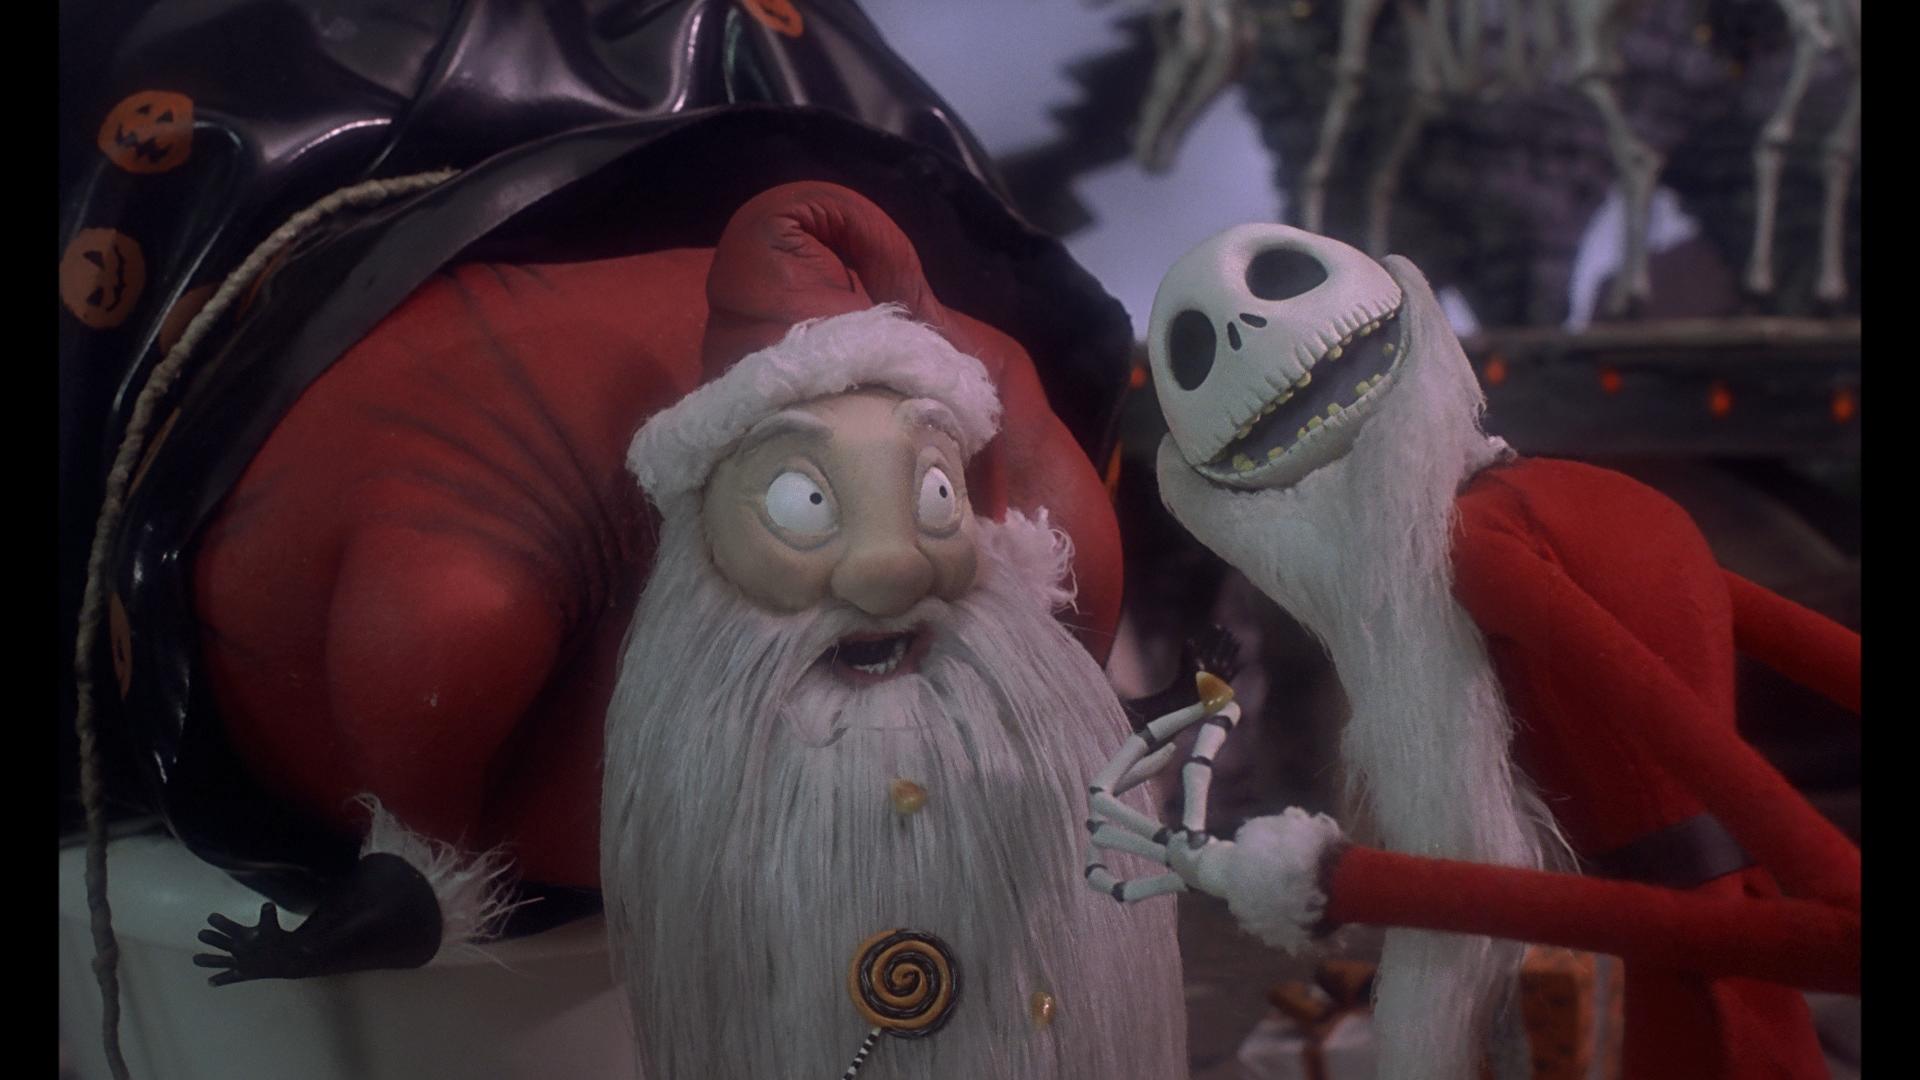 Geht immer: 'The Nightmare Before Christmas'